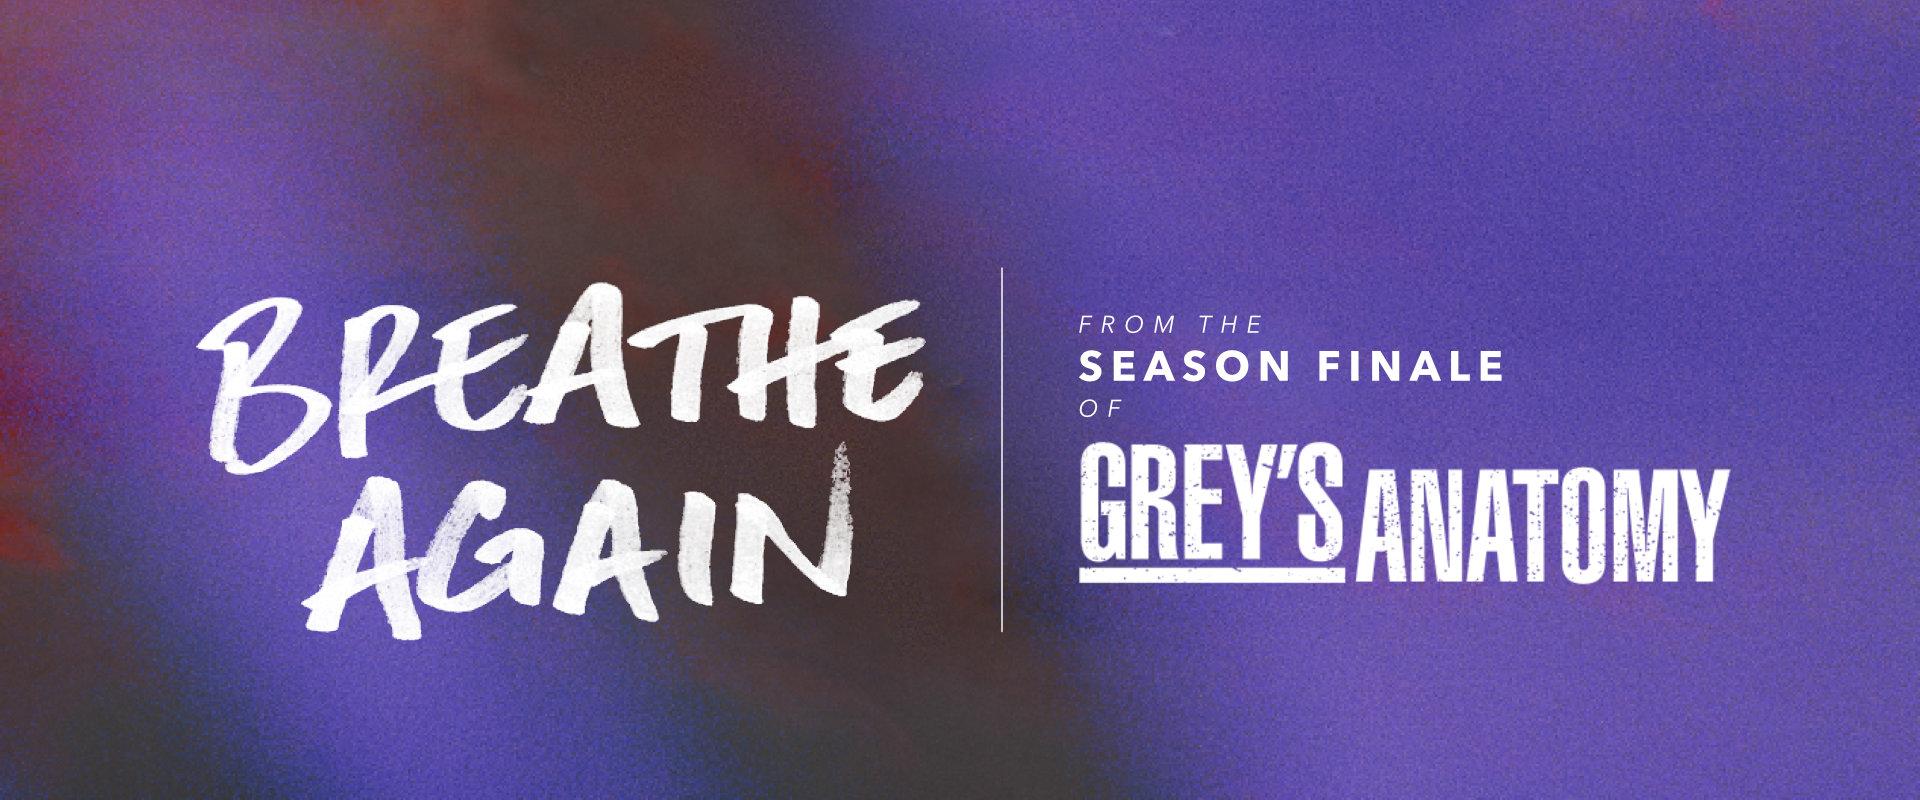 Greys-BreatheAgain_Web.jpg